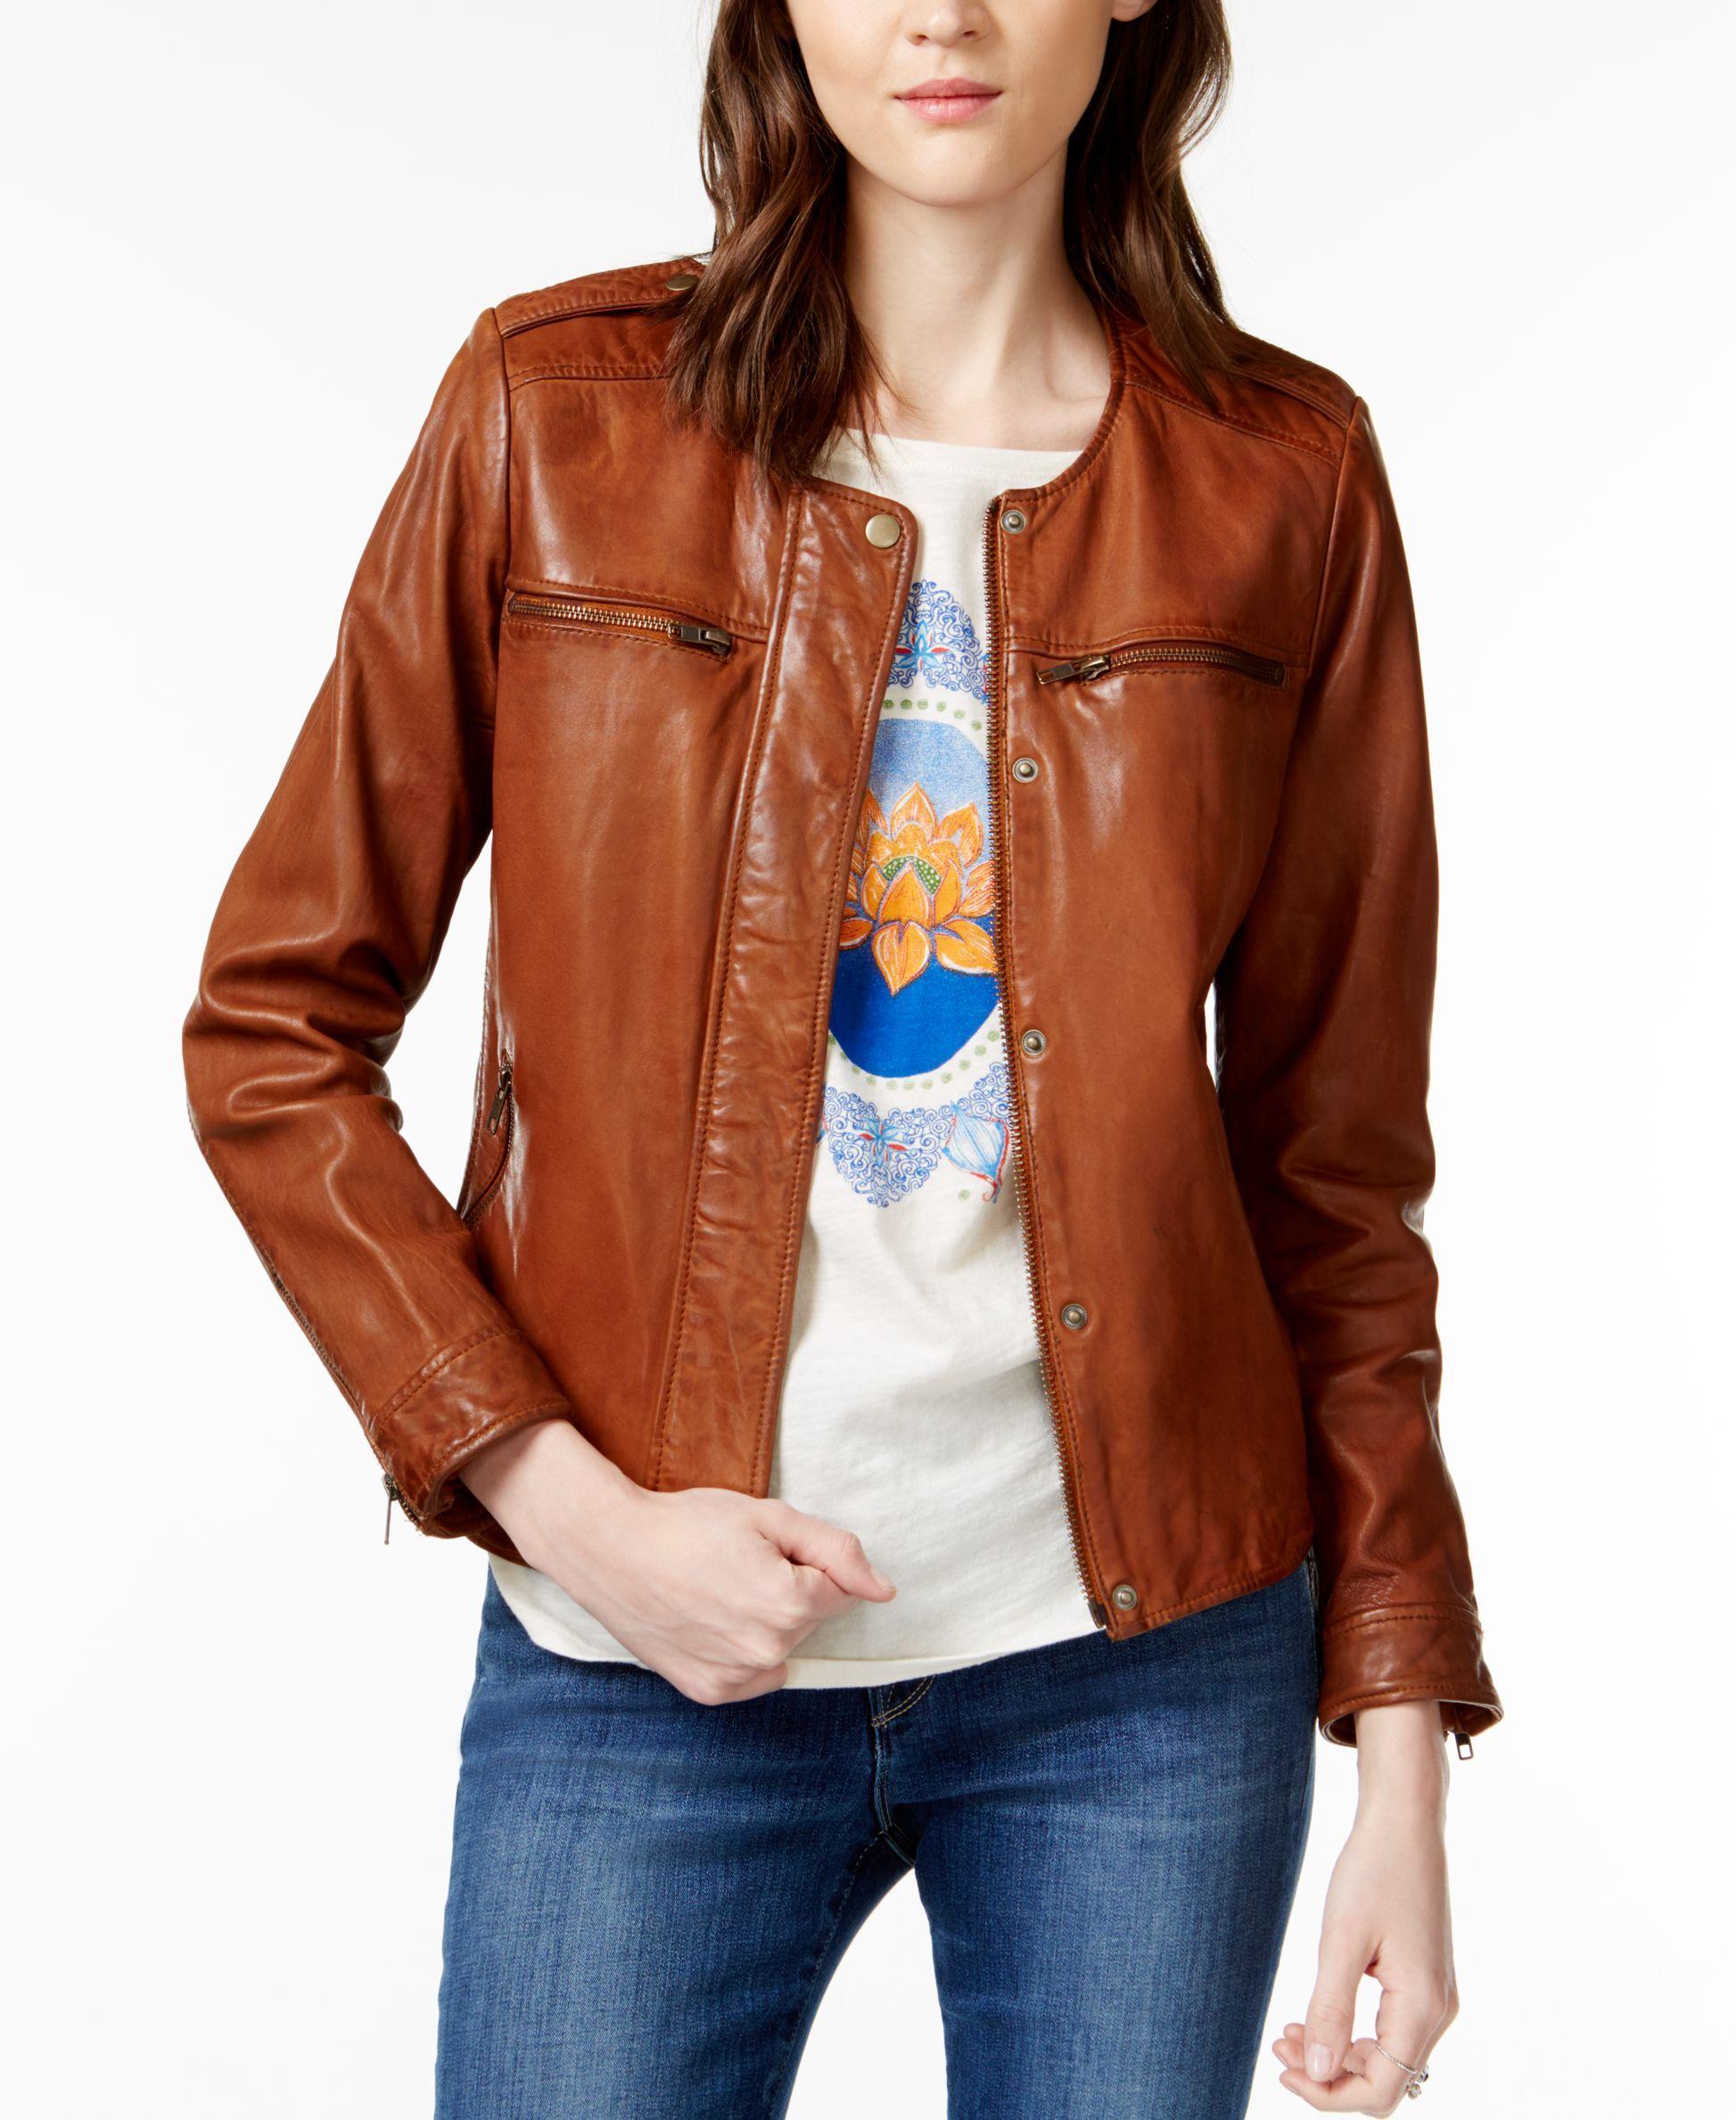 Lucky Brand Collarless Leather Jacket Blazer Jackets For Women Collarless Leather Jacket Leather Jackets Women [ 2378 x 1947 Pixel ]